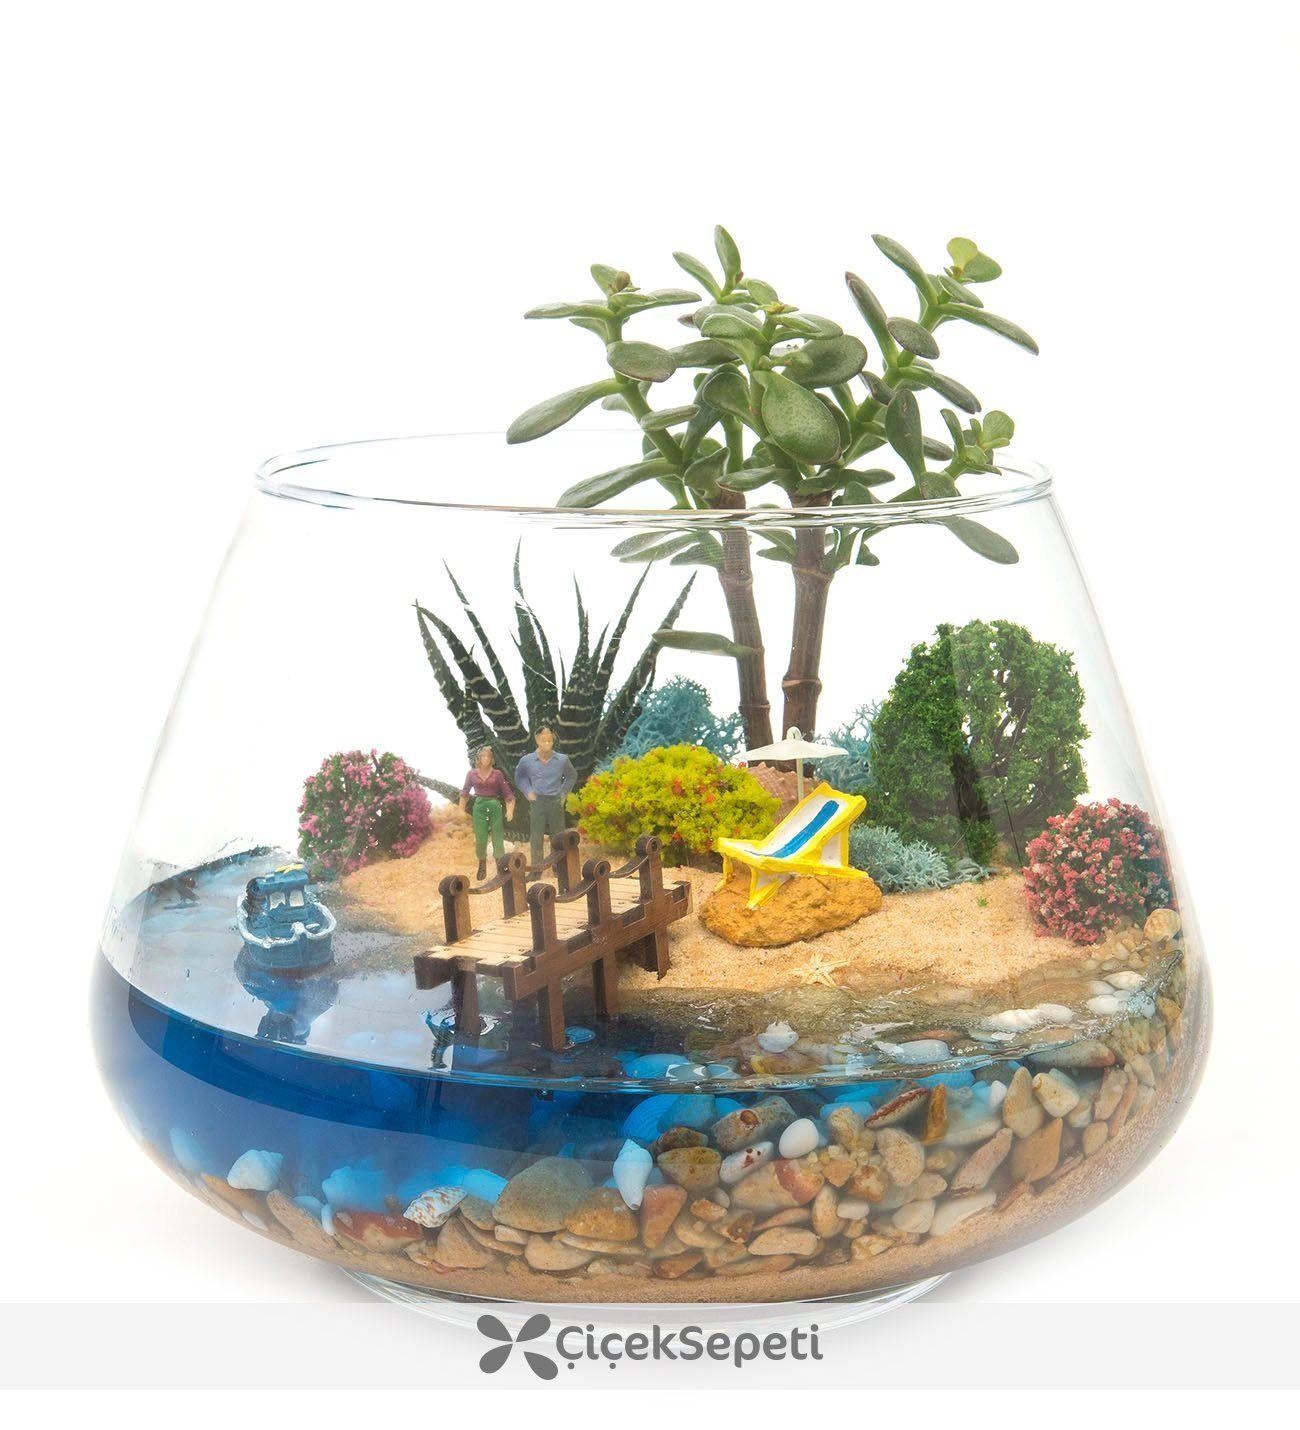 Minigarten Im Glas mahmut kırnık.2326 | floral art | pinterest | mini garten